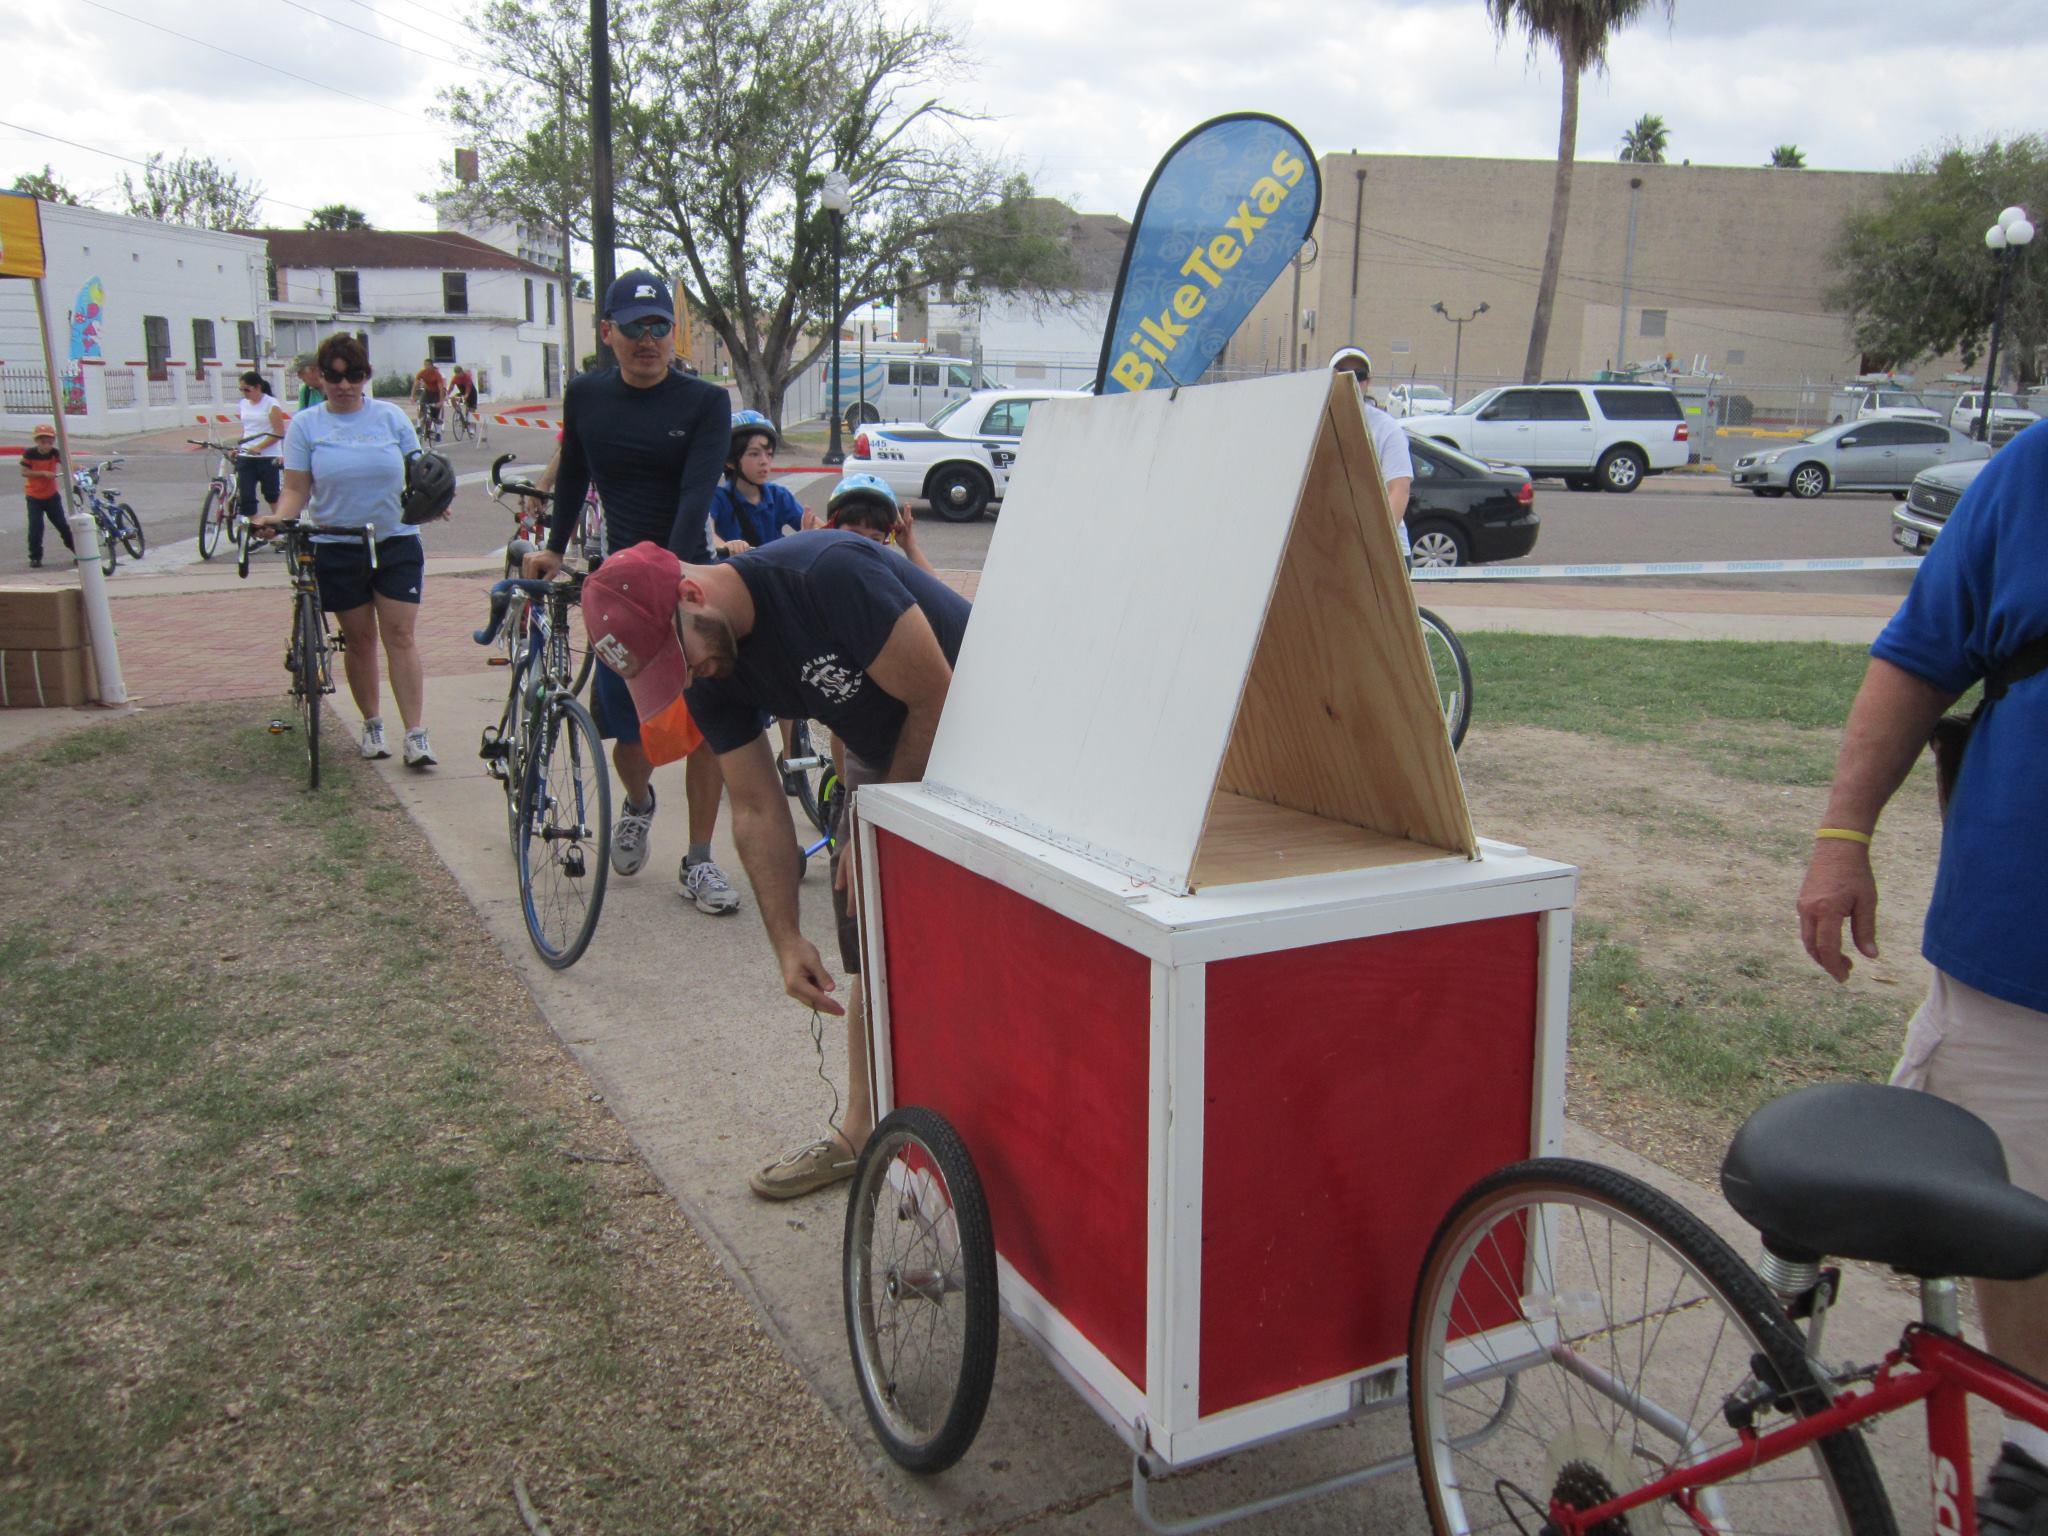 The Belden Trail-er, a design tool bike attachment